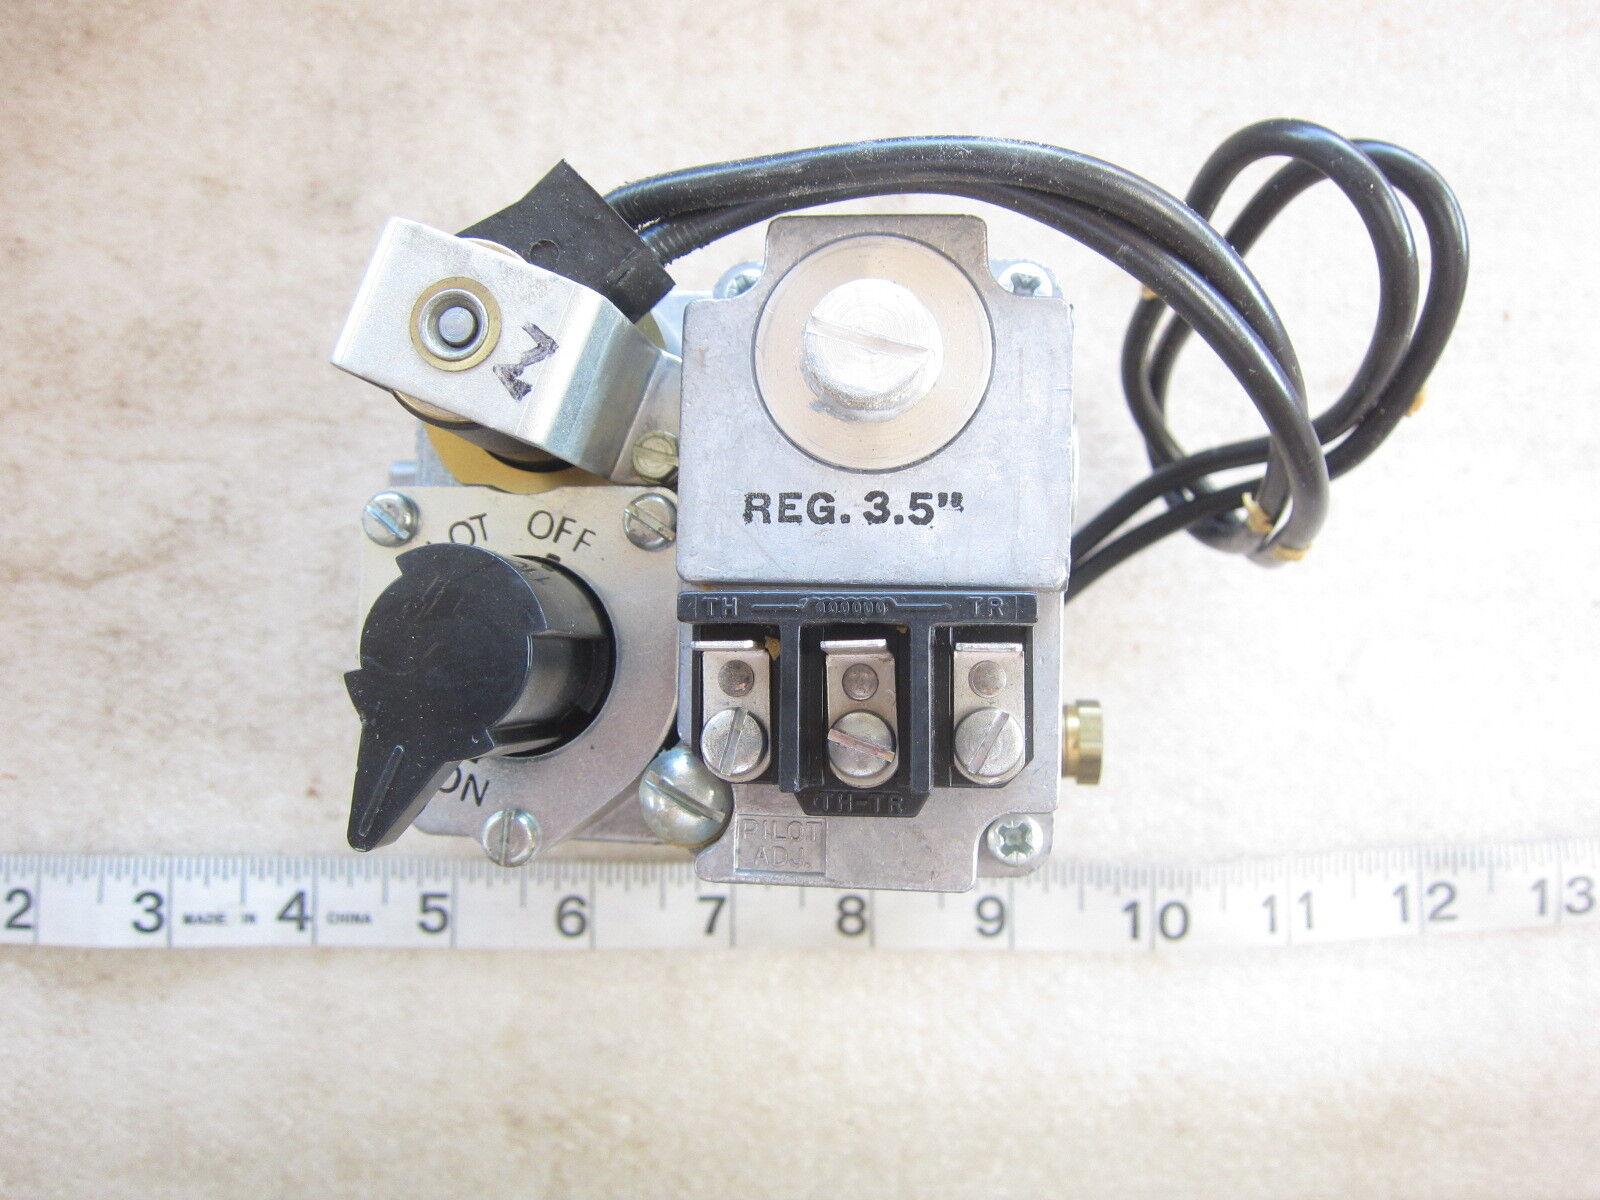 WR White Rodgers 36C68 209 60 20714 04 24V Natural Gas _57 gas valve gas valve model 36c68 24V Transformer Wiring Diagram at alyssarenee.co